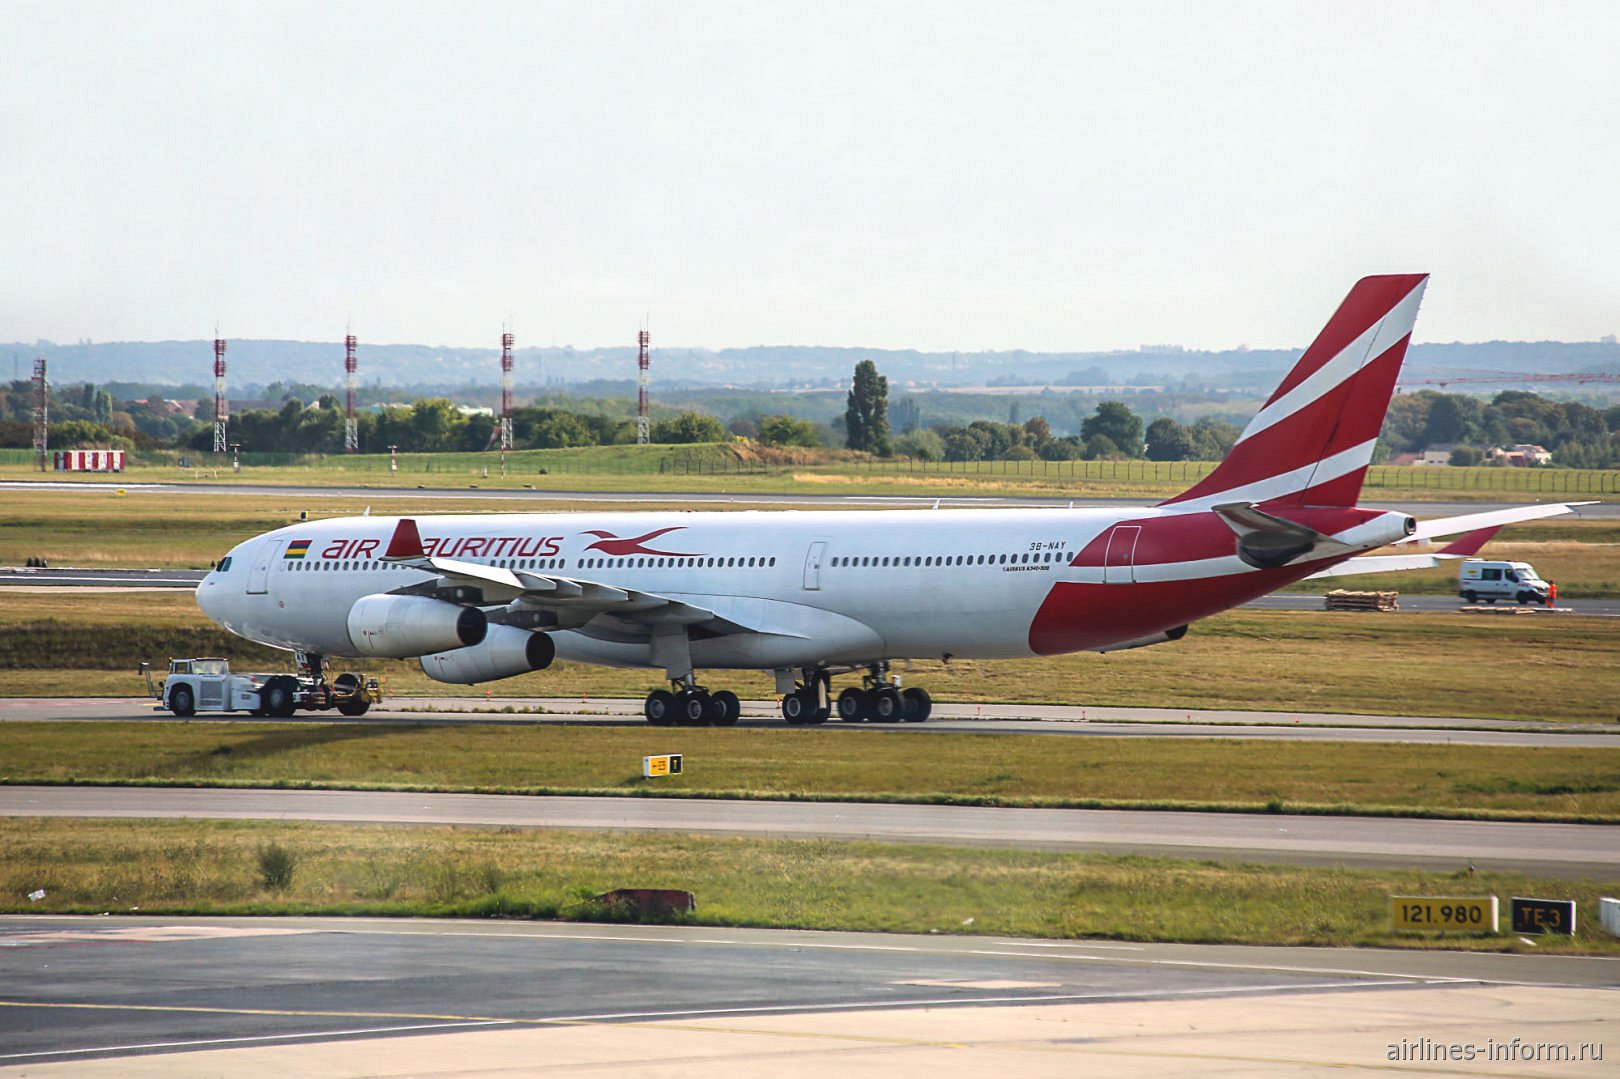 Самолет Airbus A340-300 3B-NAY авиакомпании Air Mauritius в аэропорту Париж Шарль-де-Голль